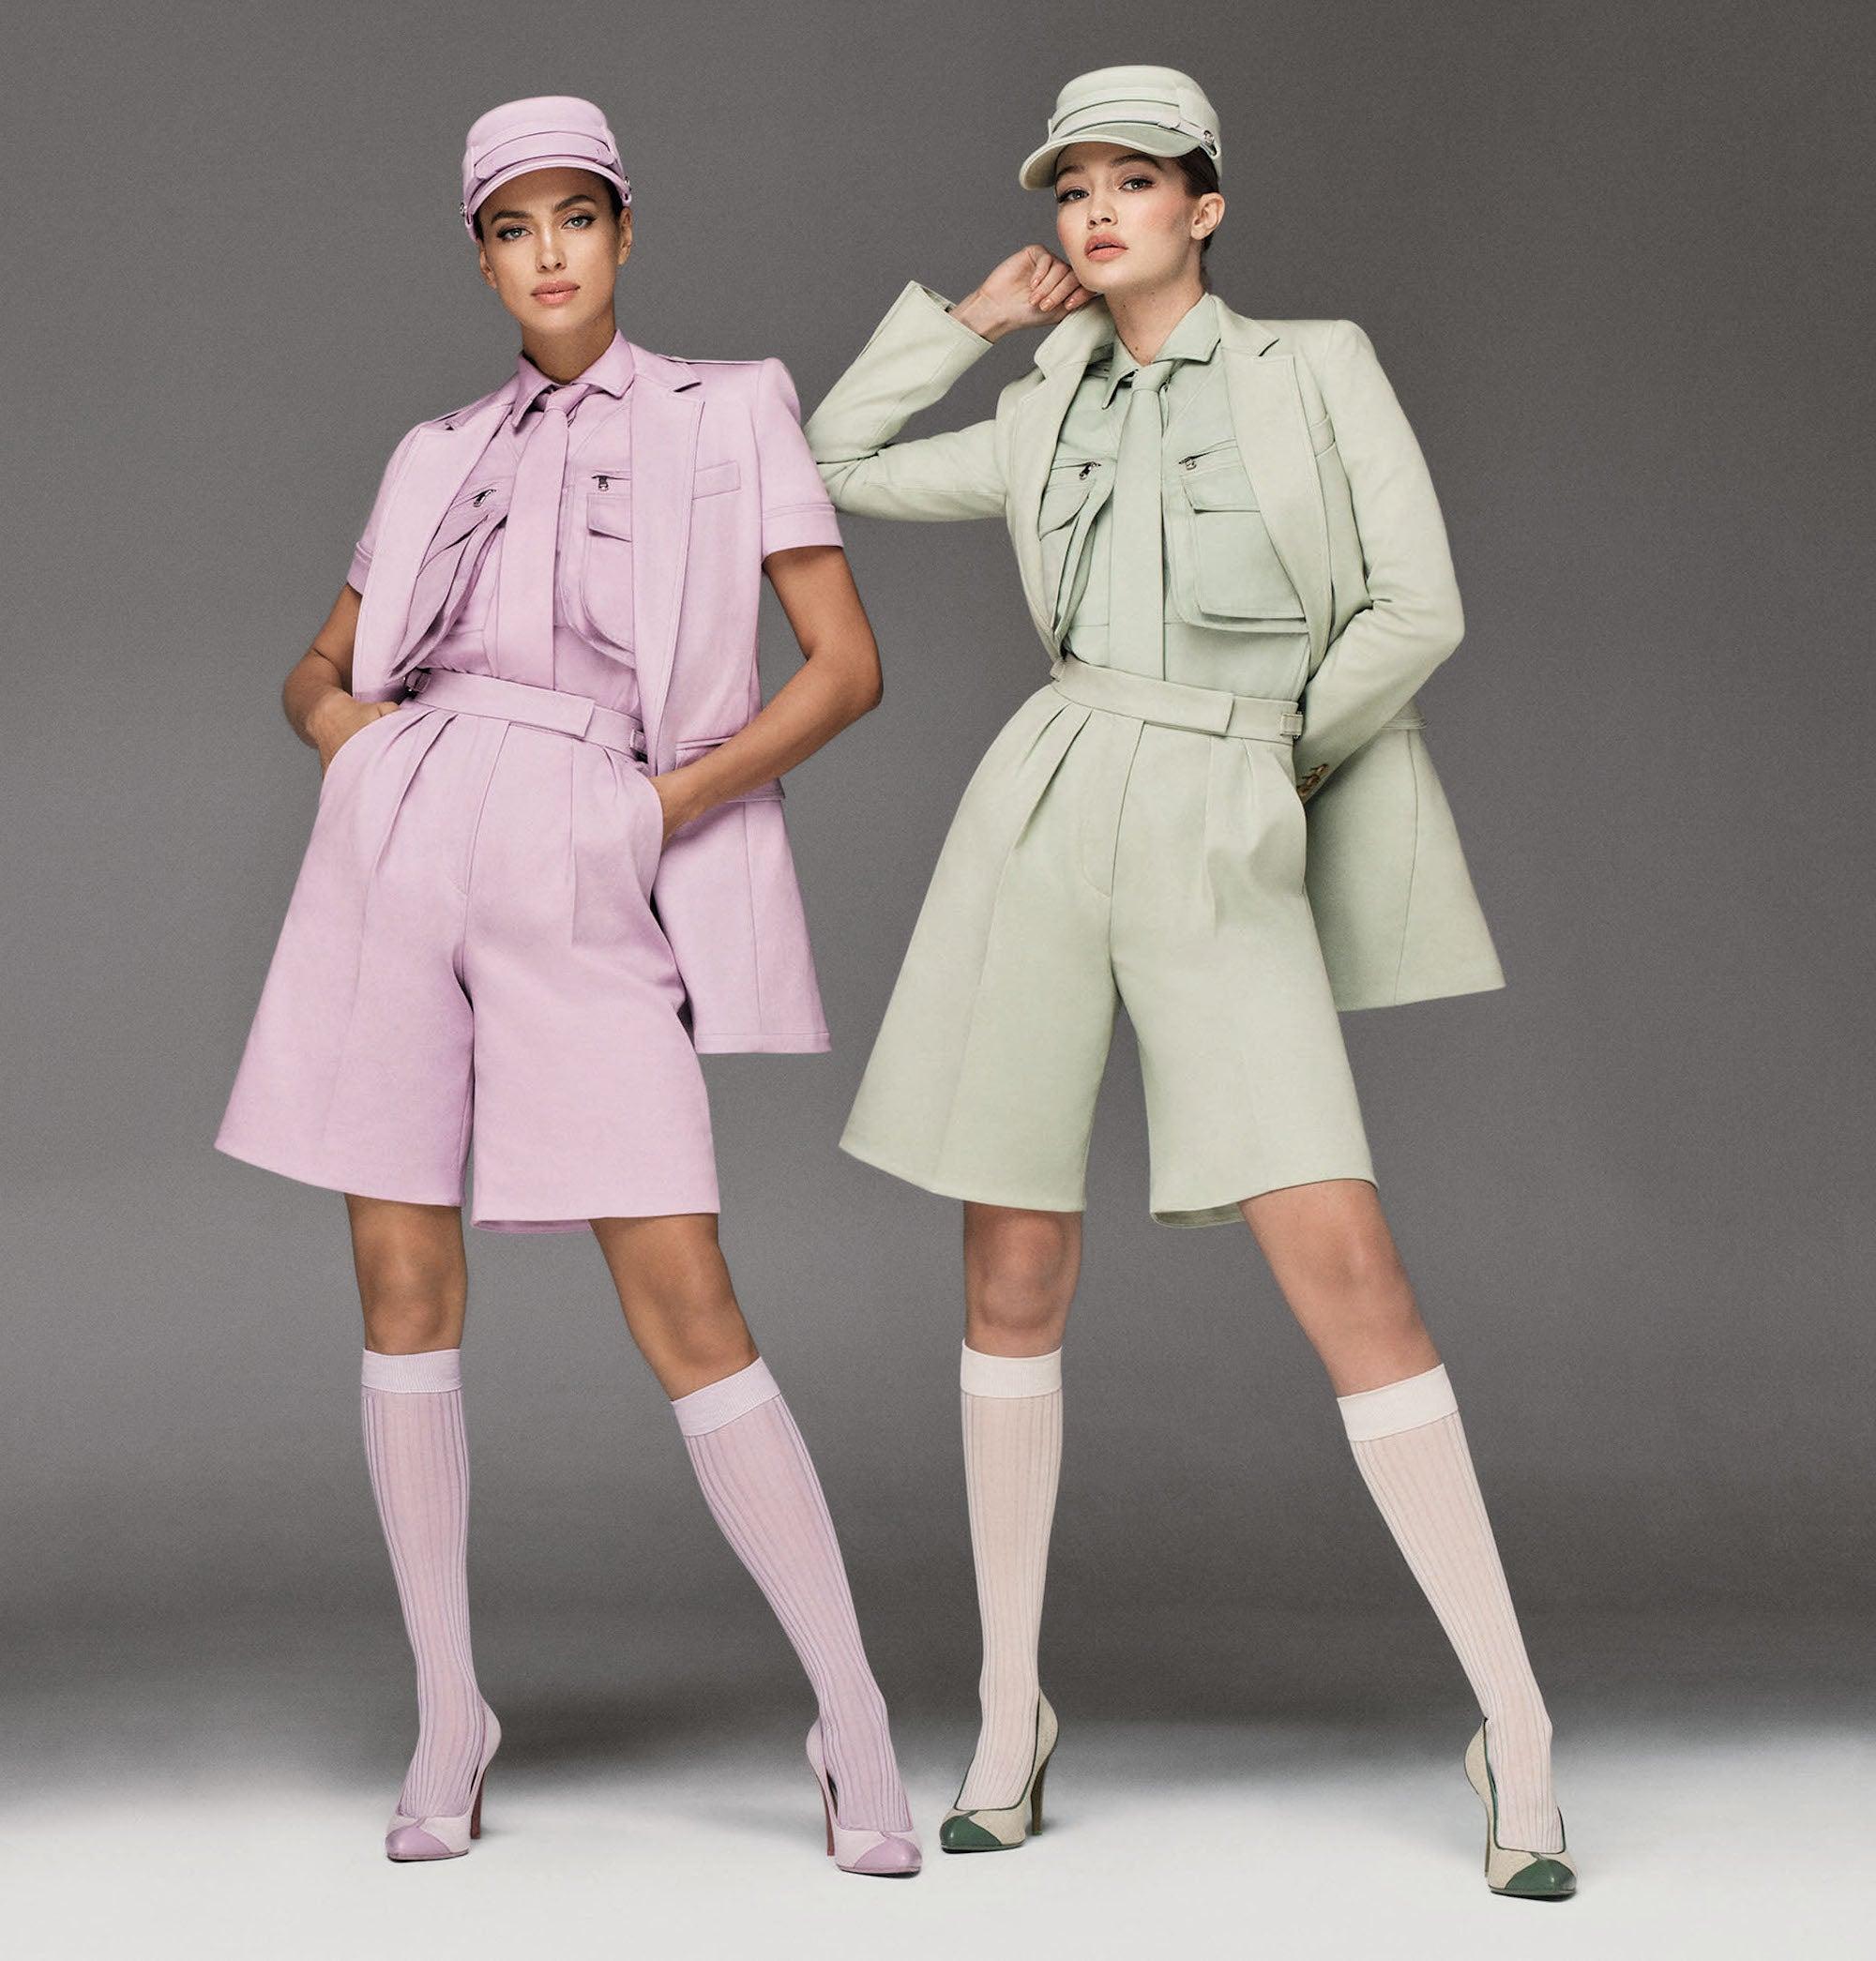 Max Mara Ss20 Fashion Campaign Is James Bond Inspired